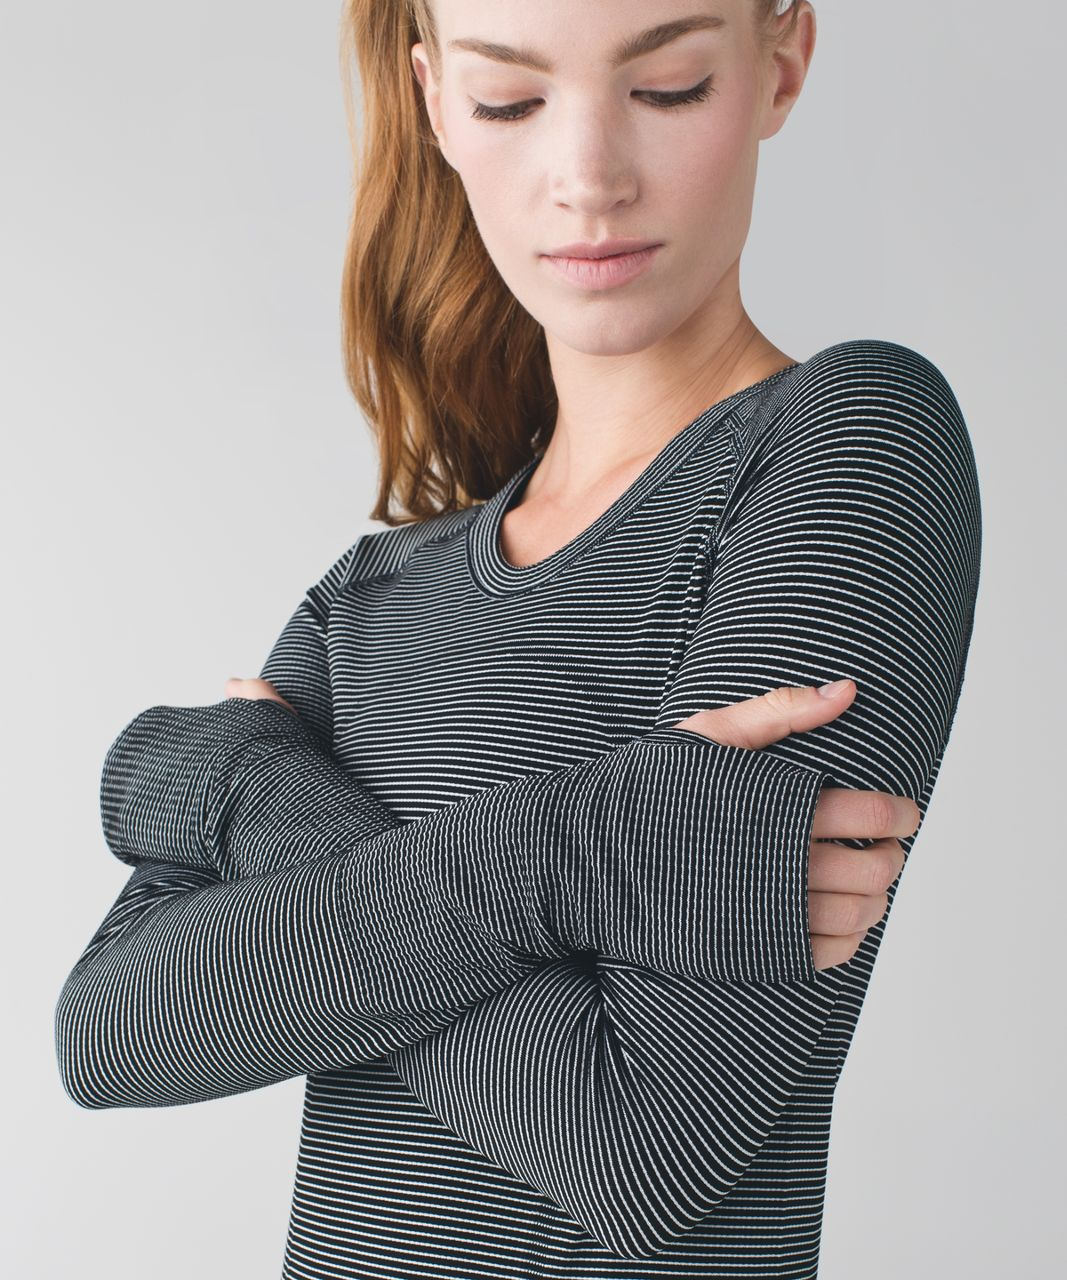 Lululemon Swiftly Tech Long Sleeve Crew - Tempo Stripe Black White